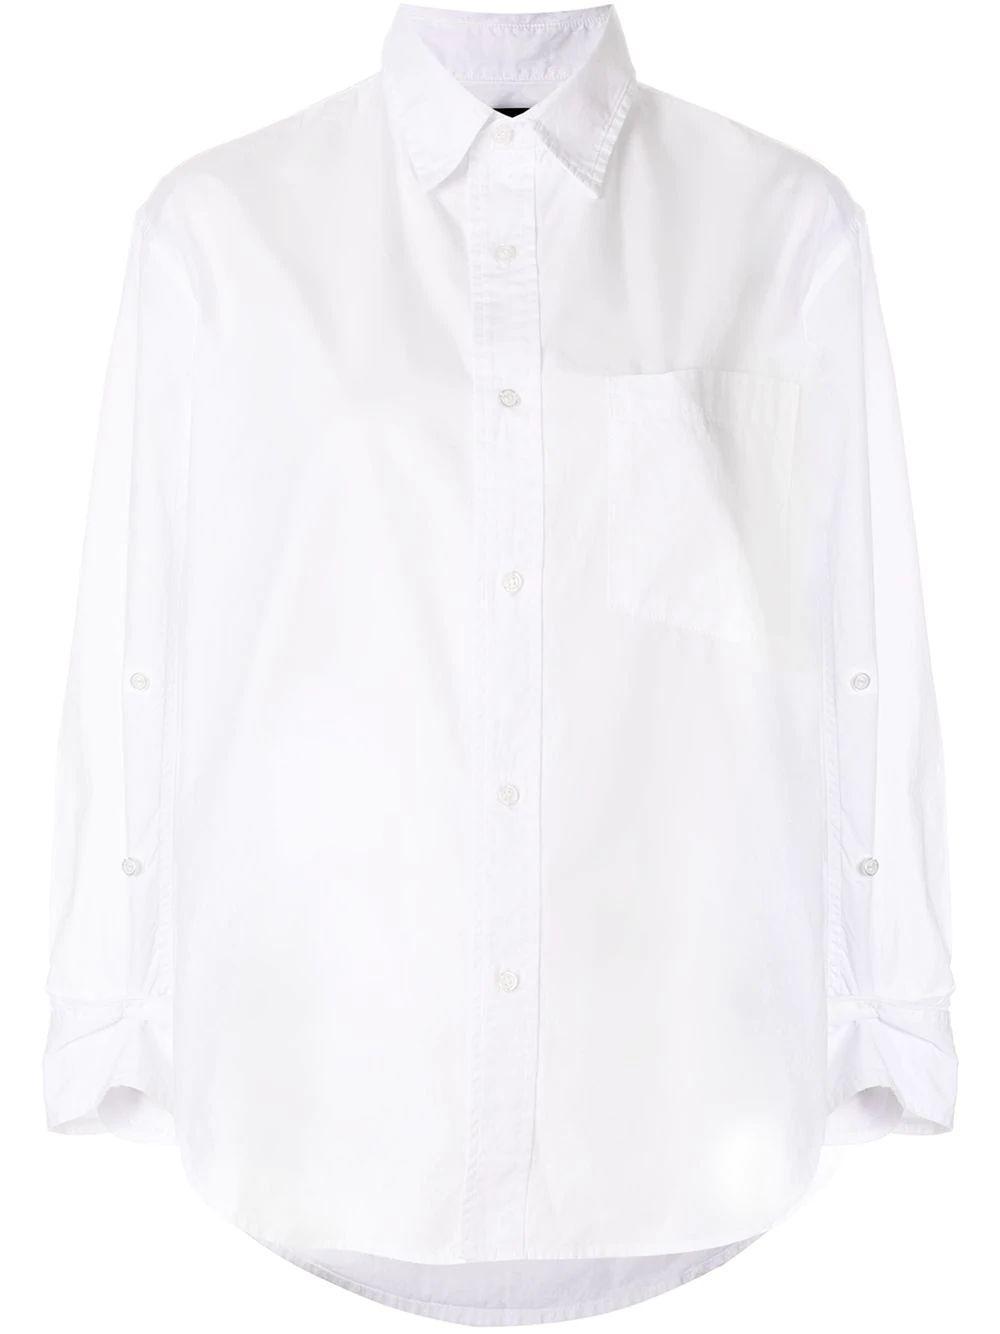 Kayla Button Down Shirt Item # 9103-741-S21